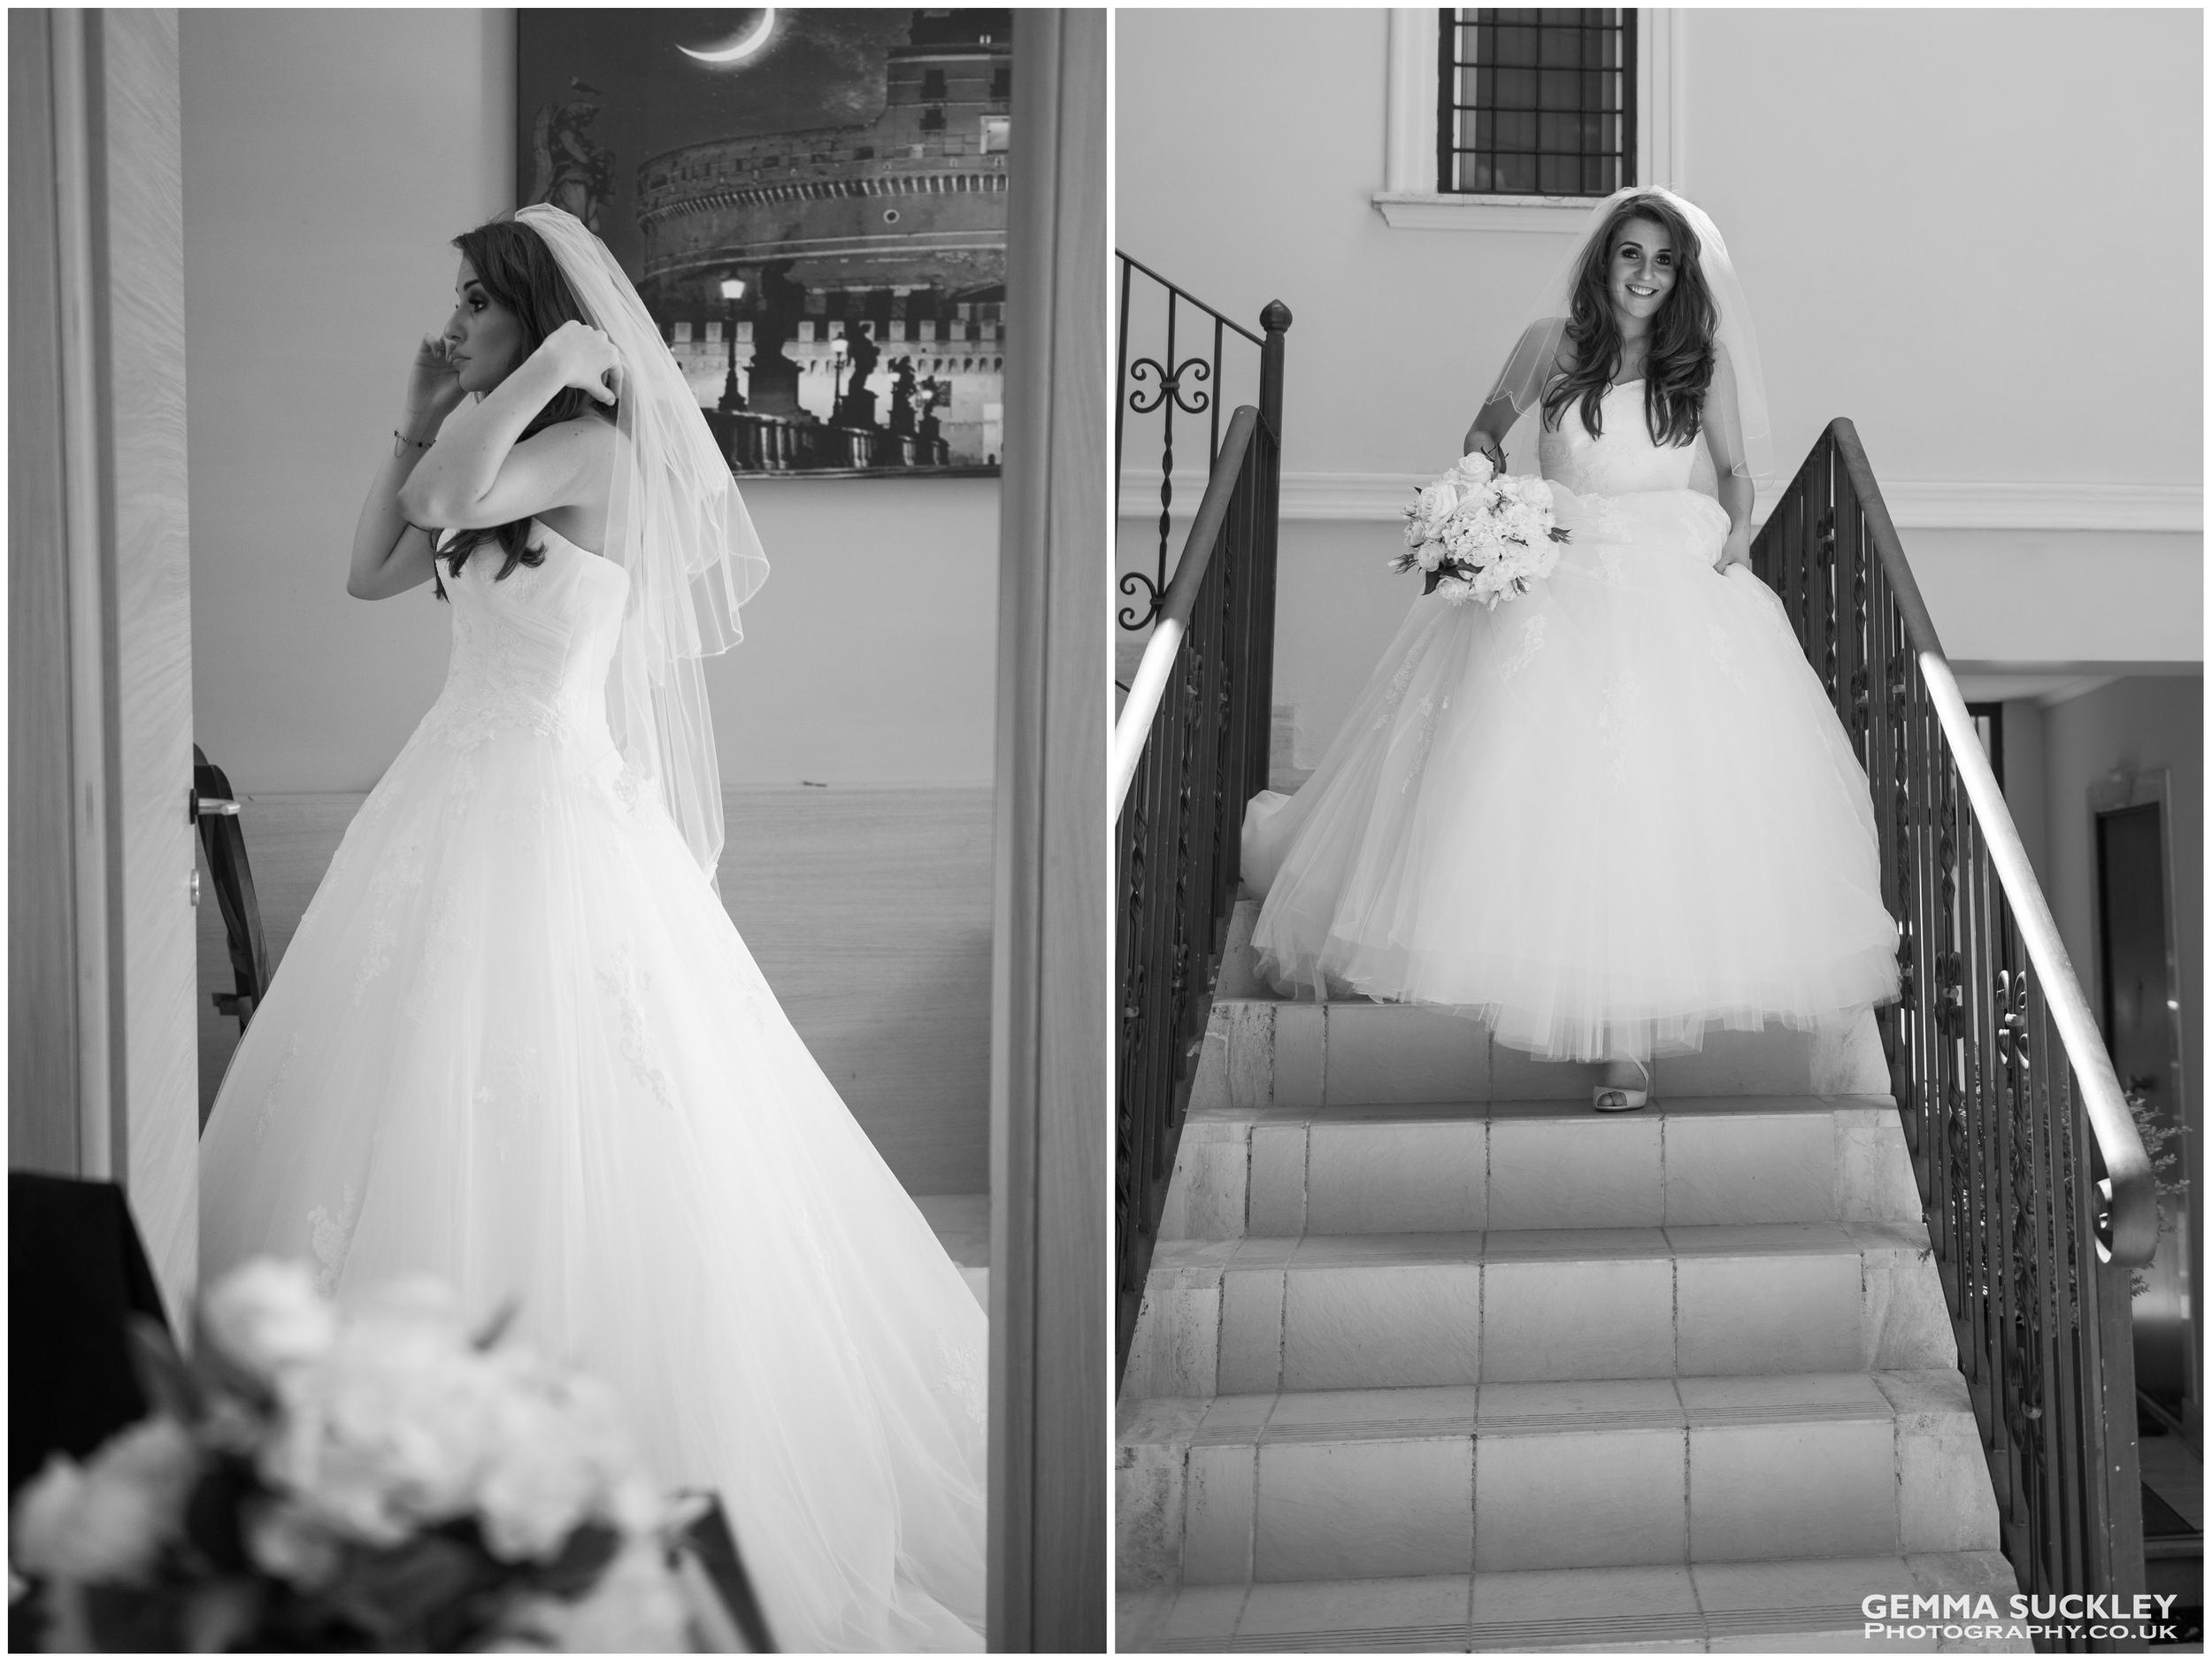 brides-in-rome-gemma-suckley-photography.jpg